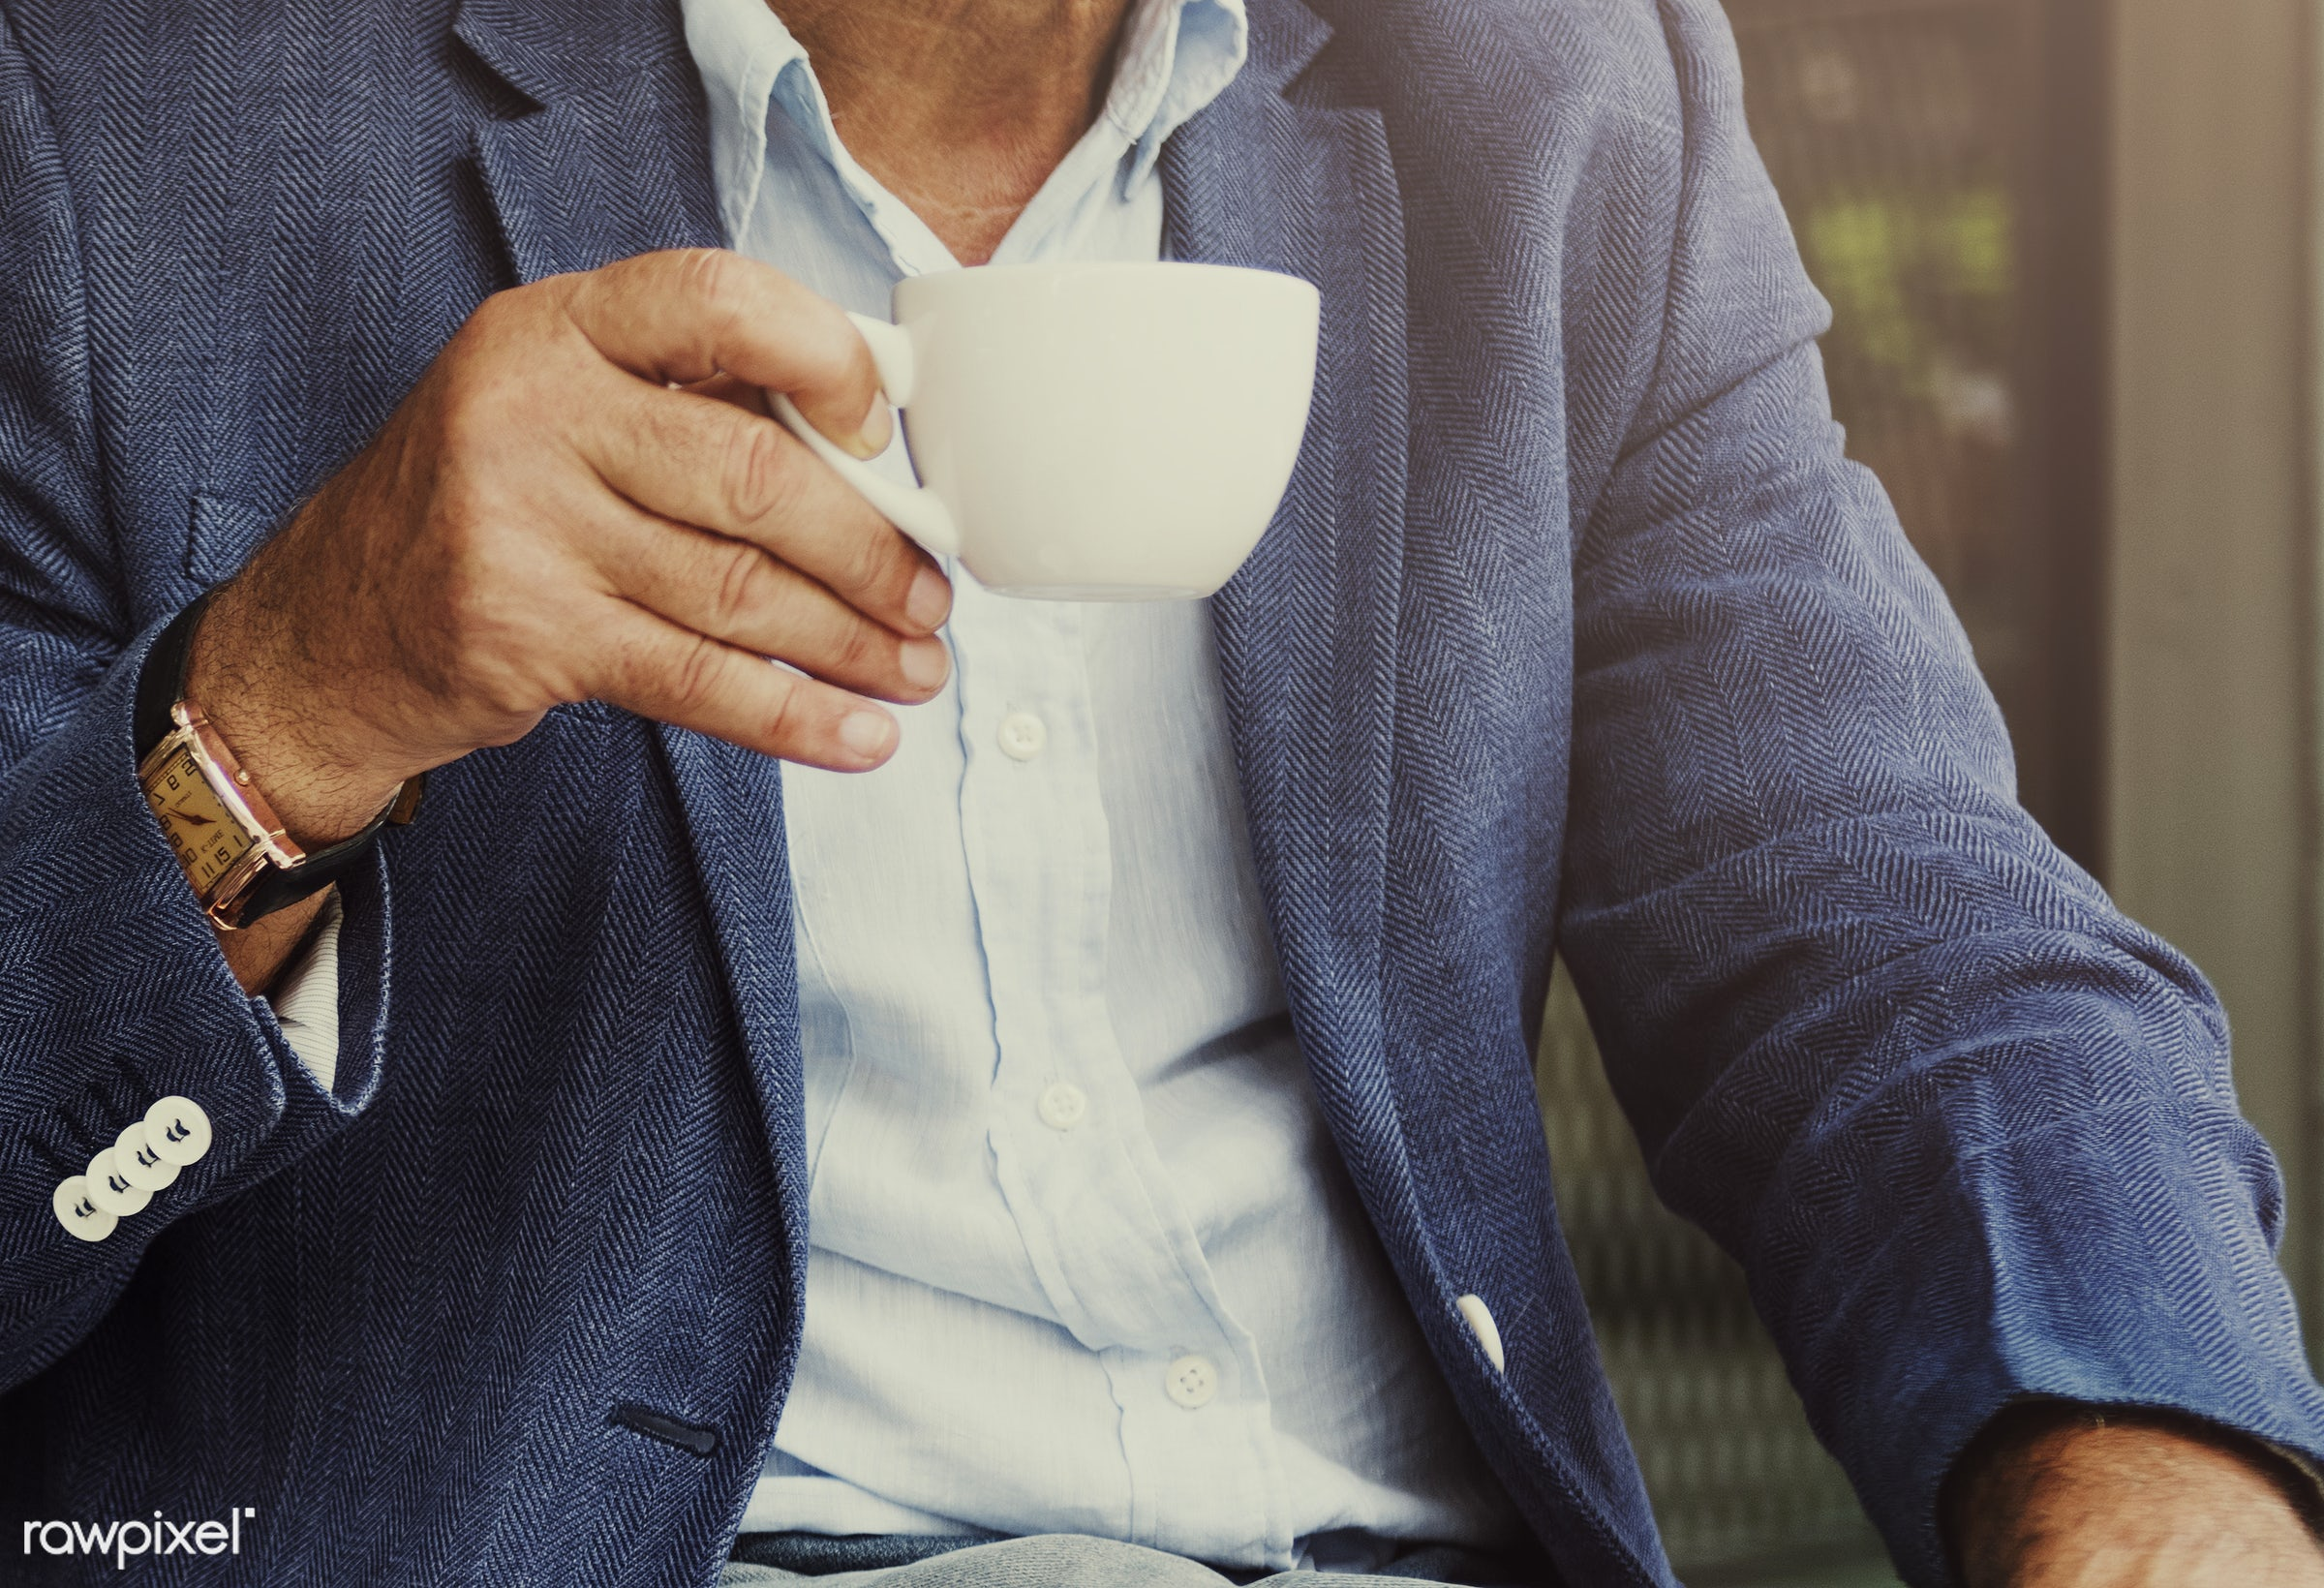 alone, beverage, break, breakfast, caffeine, cappuccino, caucasian, cheerful, coffee, coffee break, coffee shop, cup, drinks...